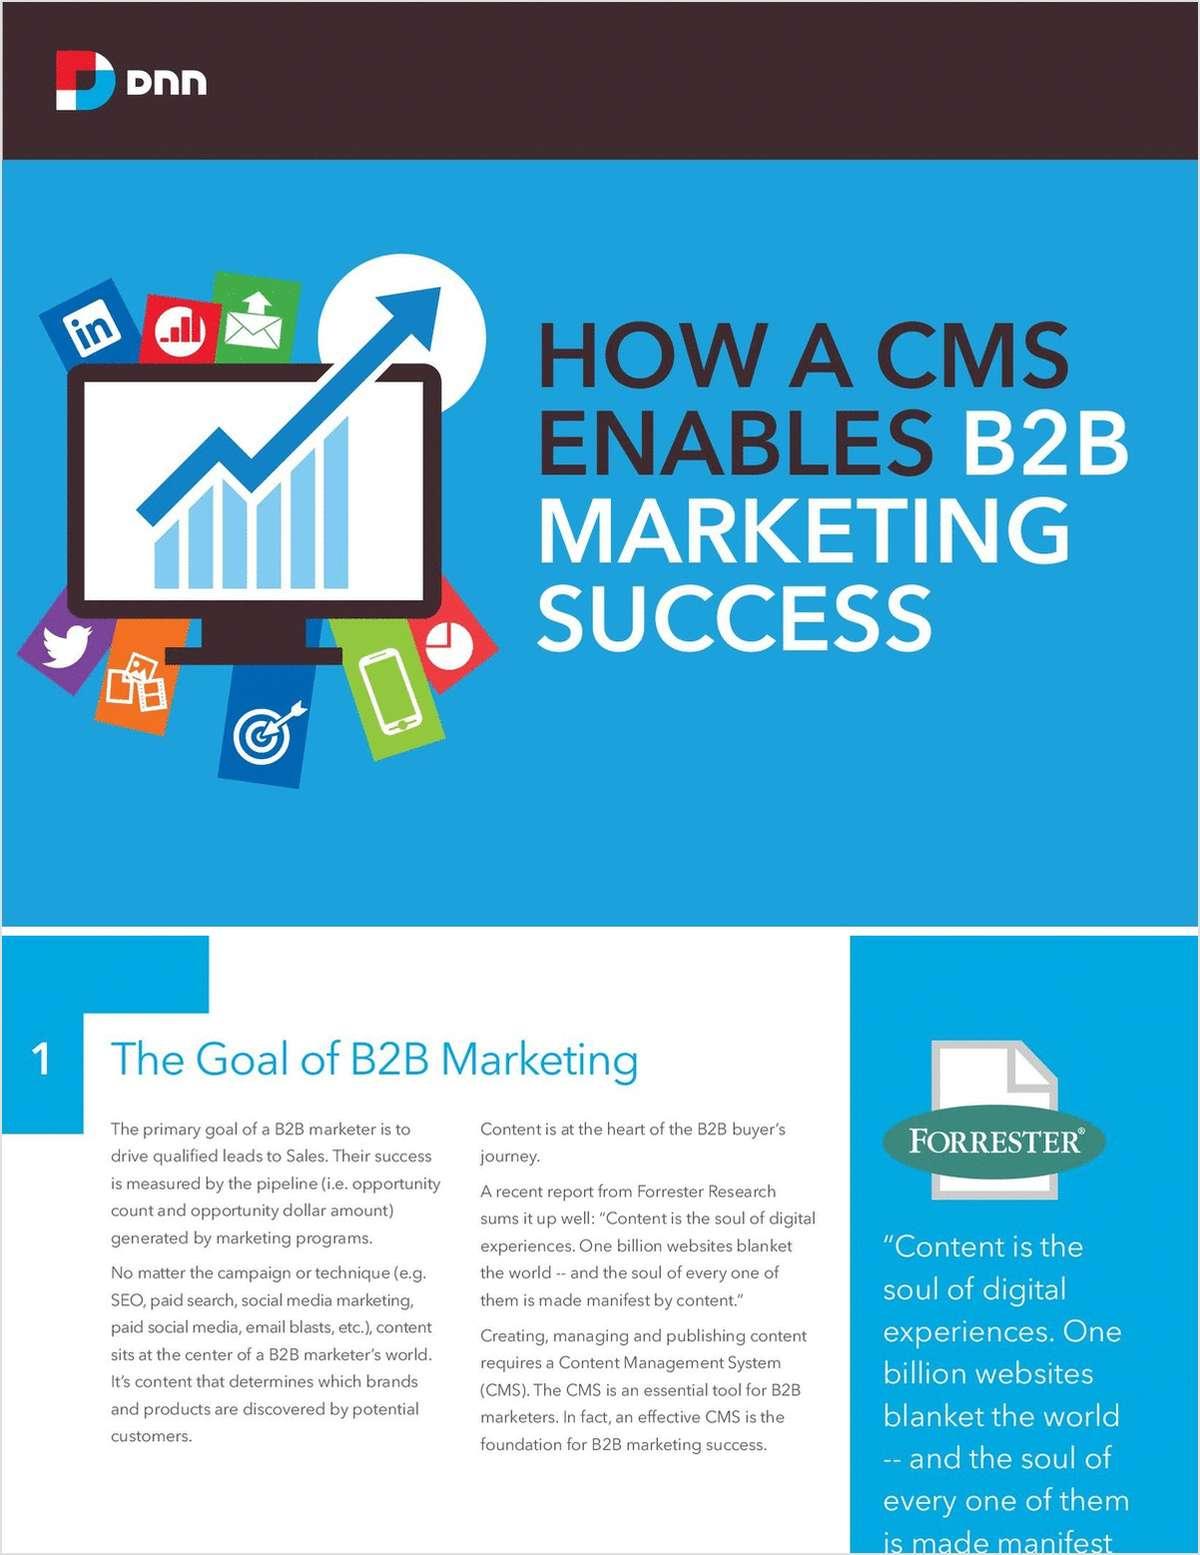 How a CMS Enables B2B Marketing Success